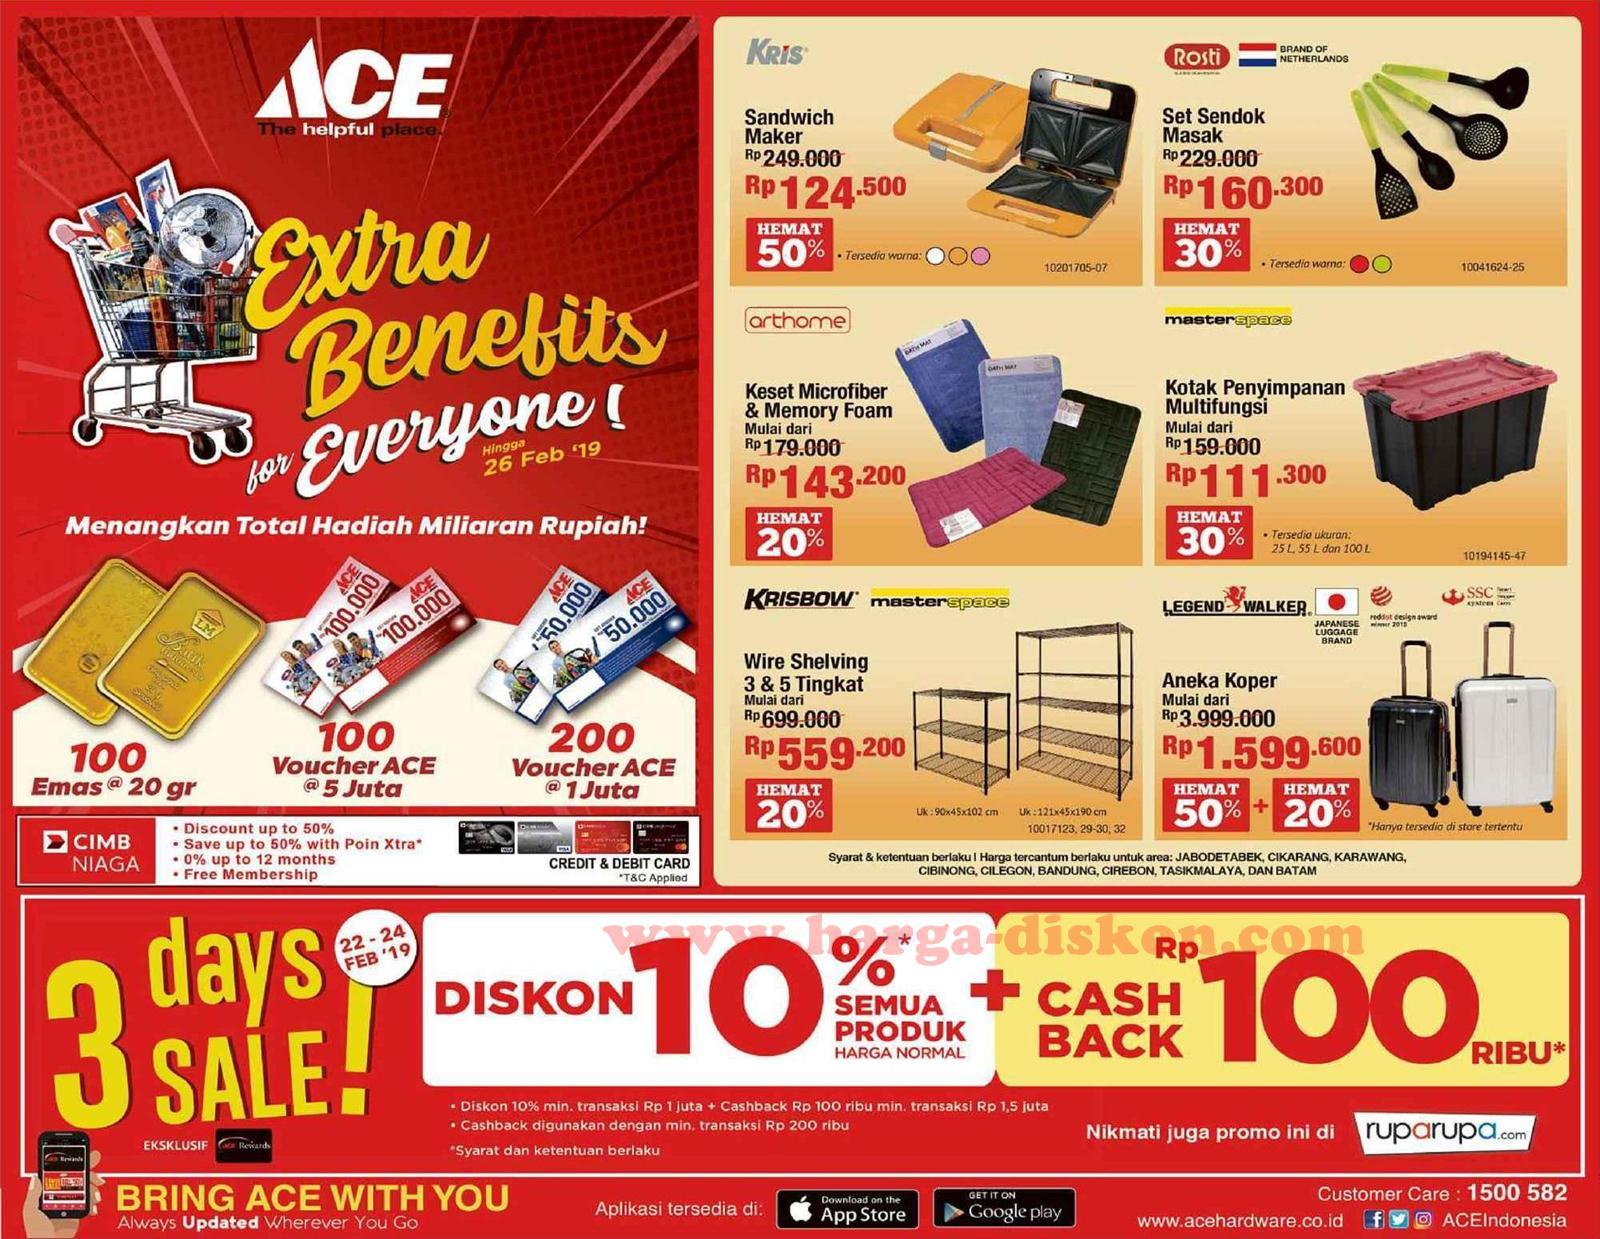 Promo Ace Hardware Terbaru Special Cashback Periode 22 24 Februari 2019 Harga Diskon